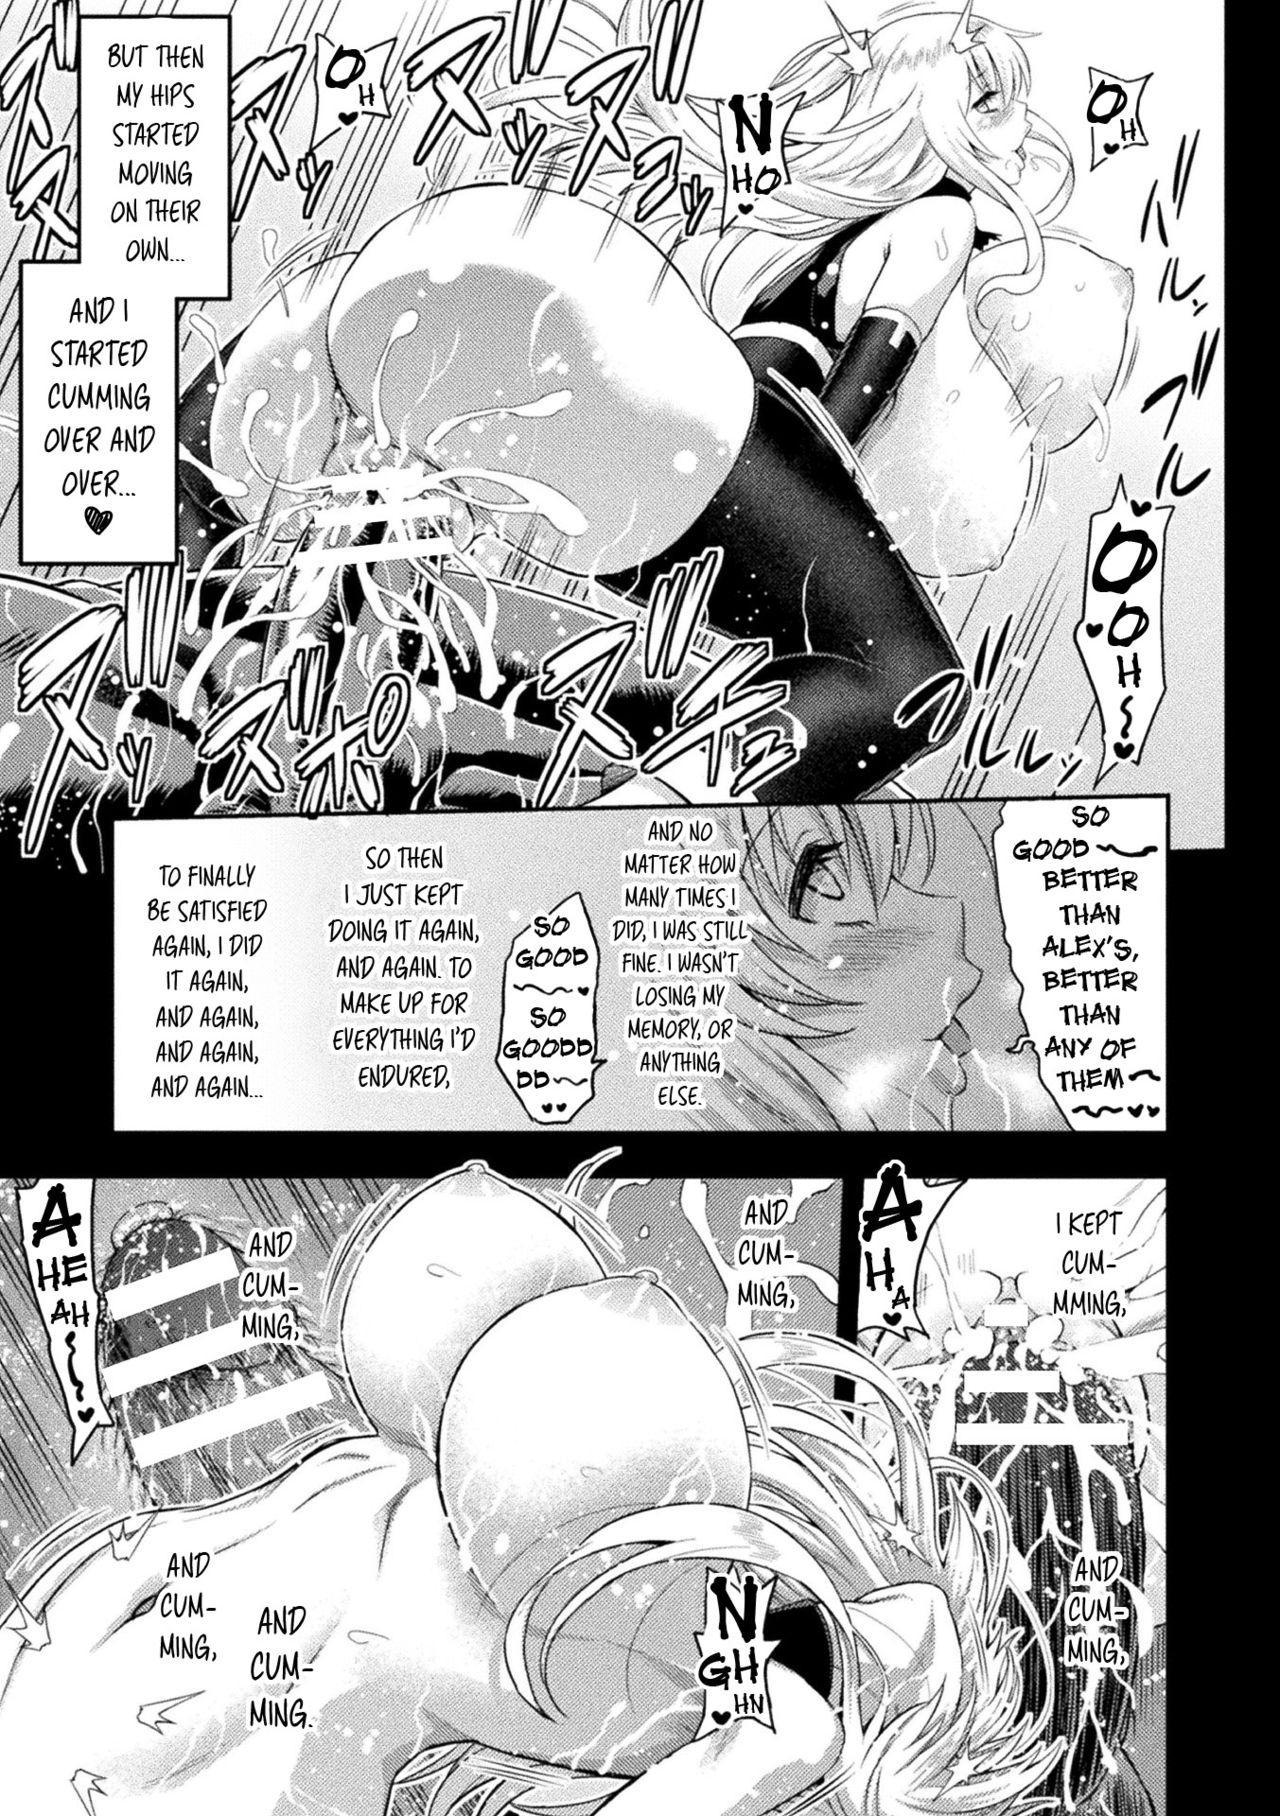 [Yamada Gogogo] Erona ~Orc no Inmon ni Okasareta Onna Kishi no Matsuro~ | Erona ~The Fall of a Beautiful Knight Cursed with the Lewd Mark of an Orc~ [English] {darknight} 161